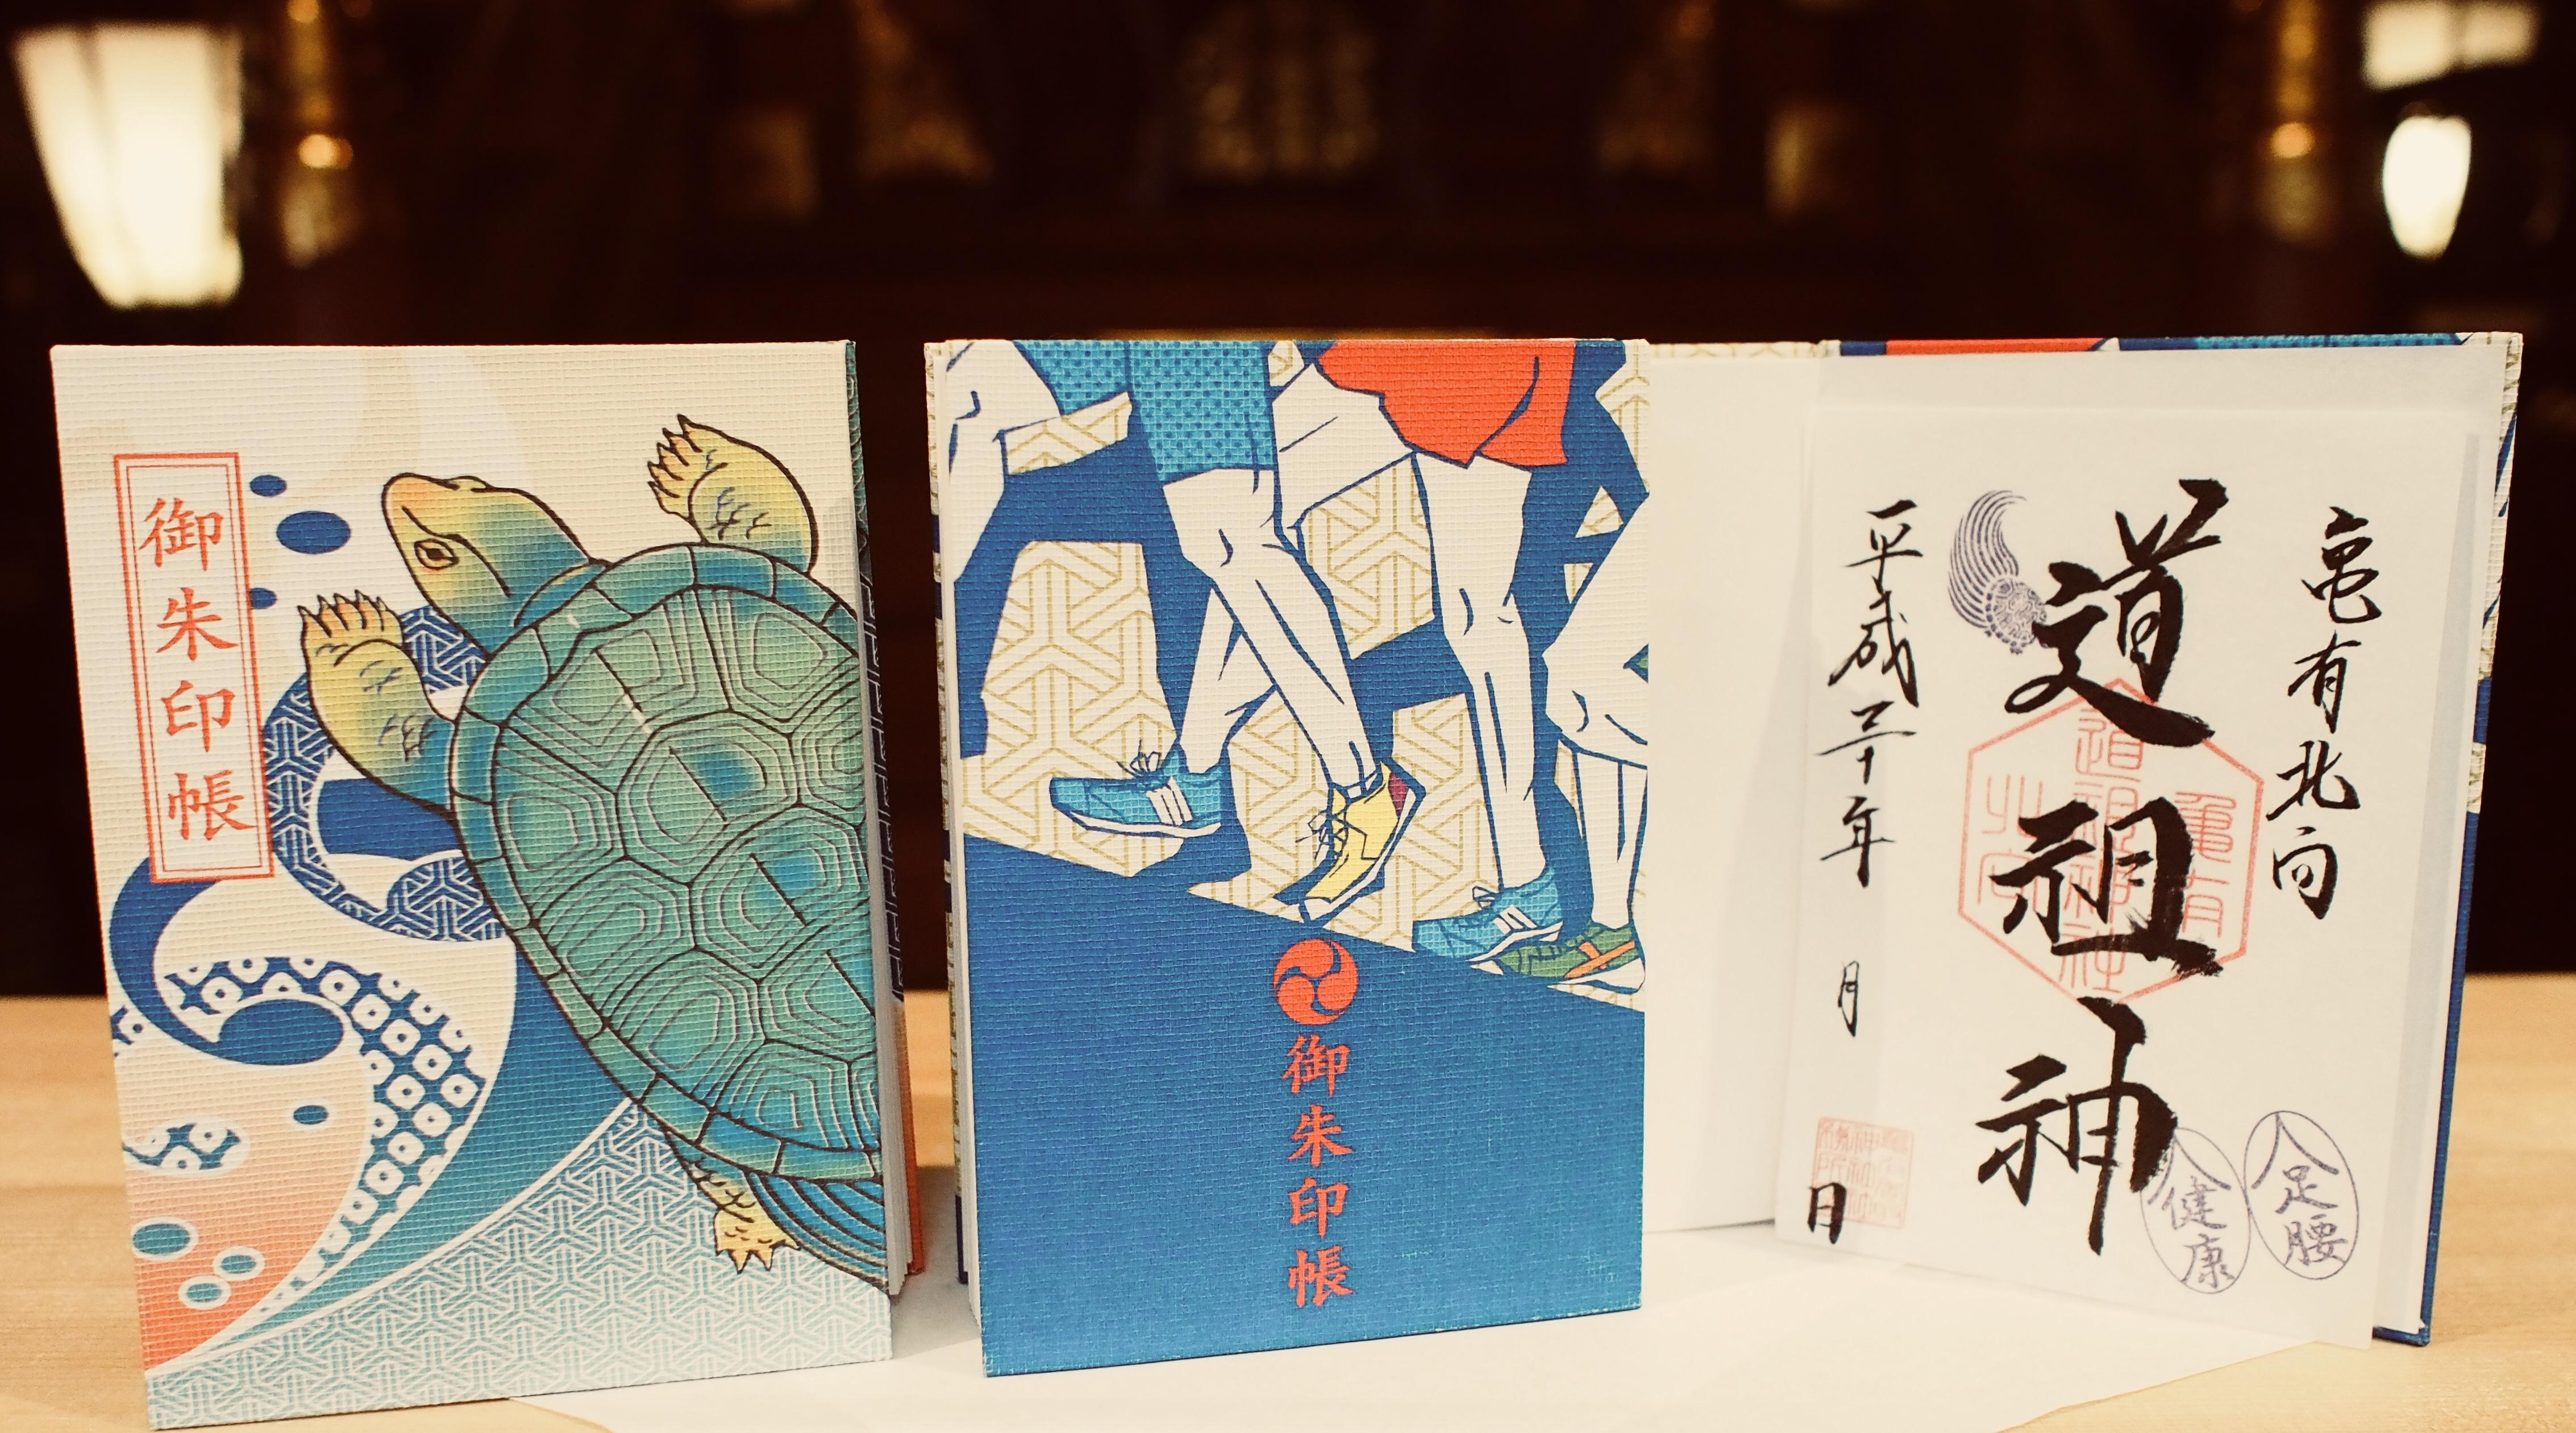 亀有北向道祖神社ご朱印、新御朱印帳頒布開始のご案内